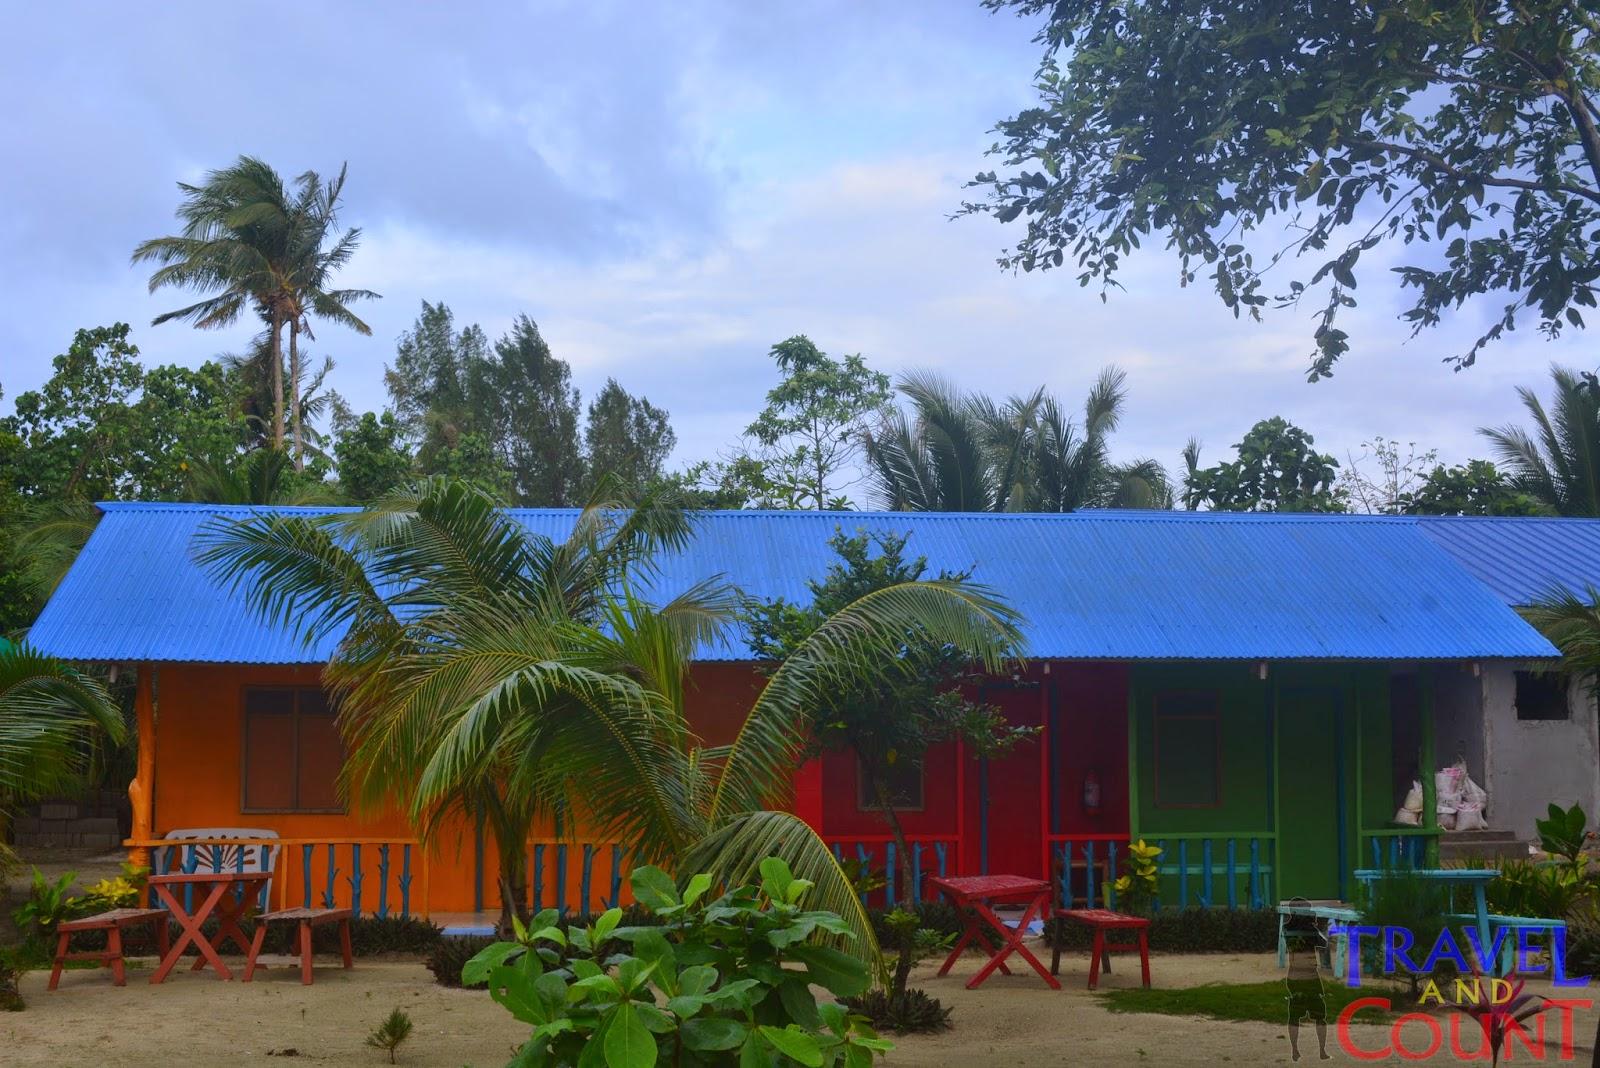 Joven's Resort Cottages, Cagbalete Island